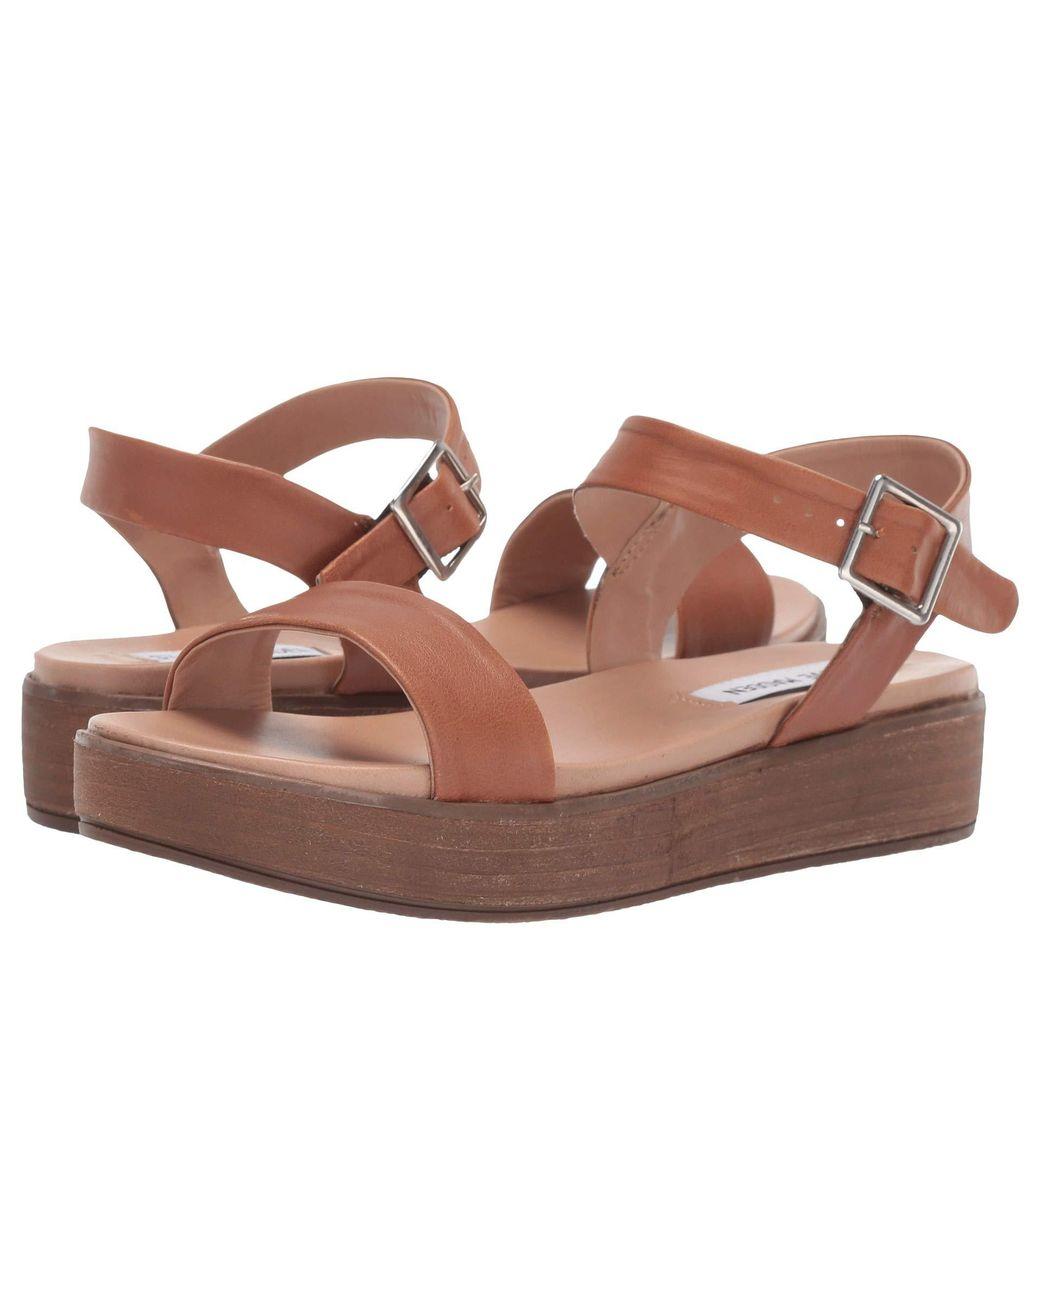 8fd1fdcacc22 Lyst - Steve Madden Aida-1 Platform Sandal (black Leather) Women s ...